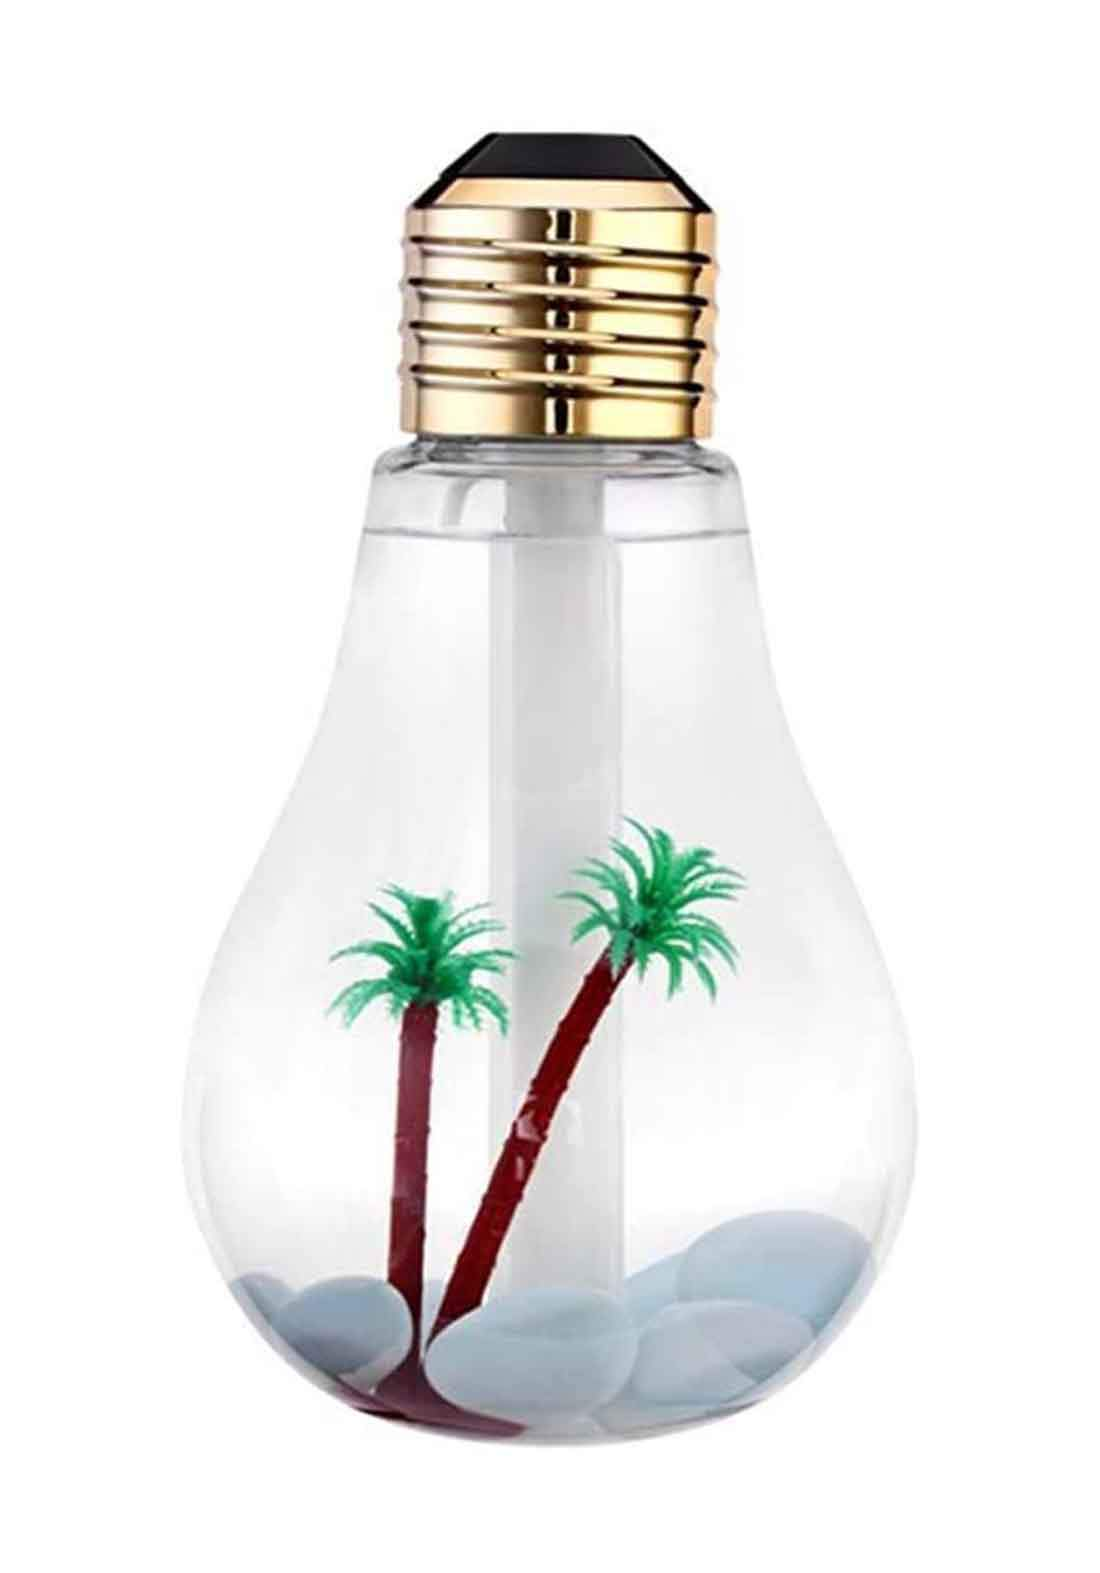 Air Humidifier Bulb USB Charge مبخرة هواء400 مل